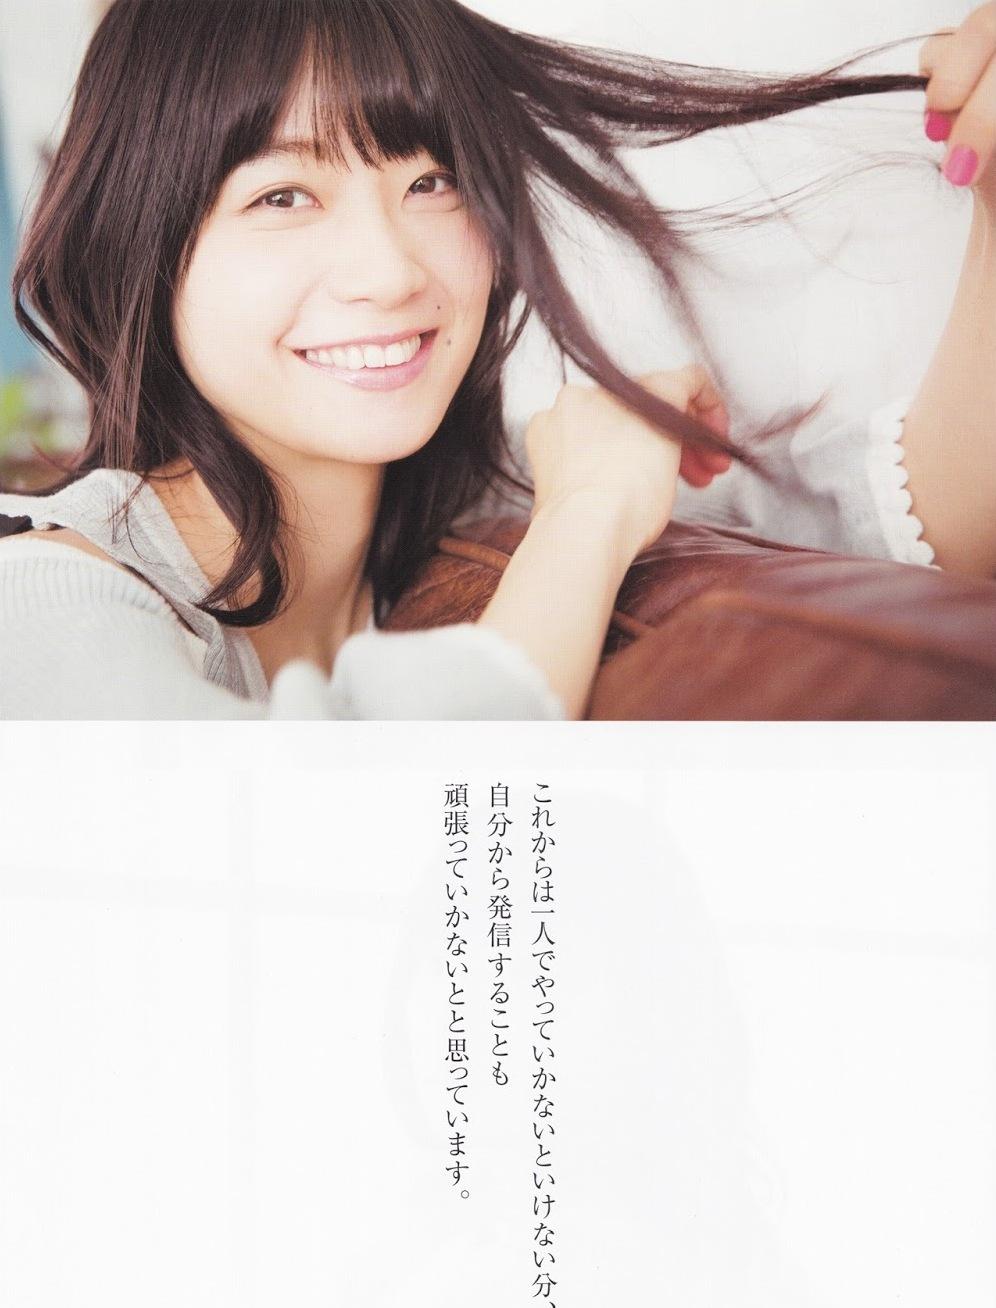 fukagawa girls 387 followers, 365 following, 85 posts - see instagram photos and videos from kotori fukagawa (@kotori_mtg).